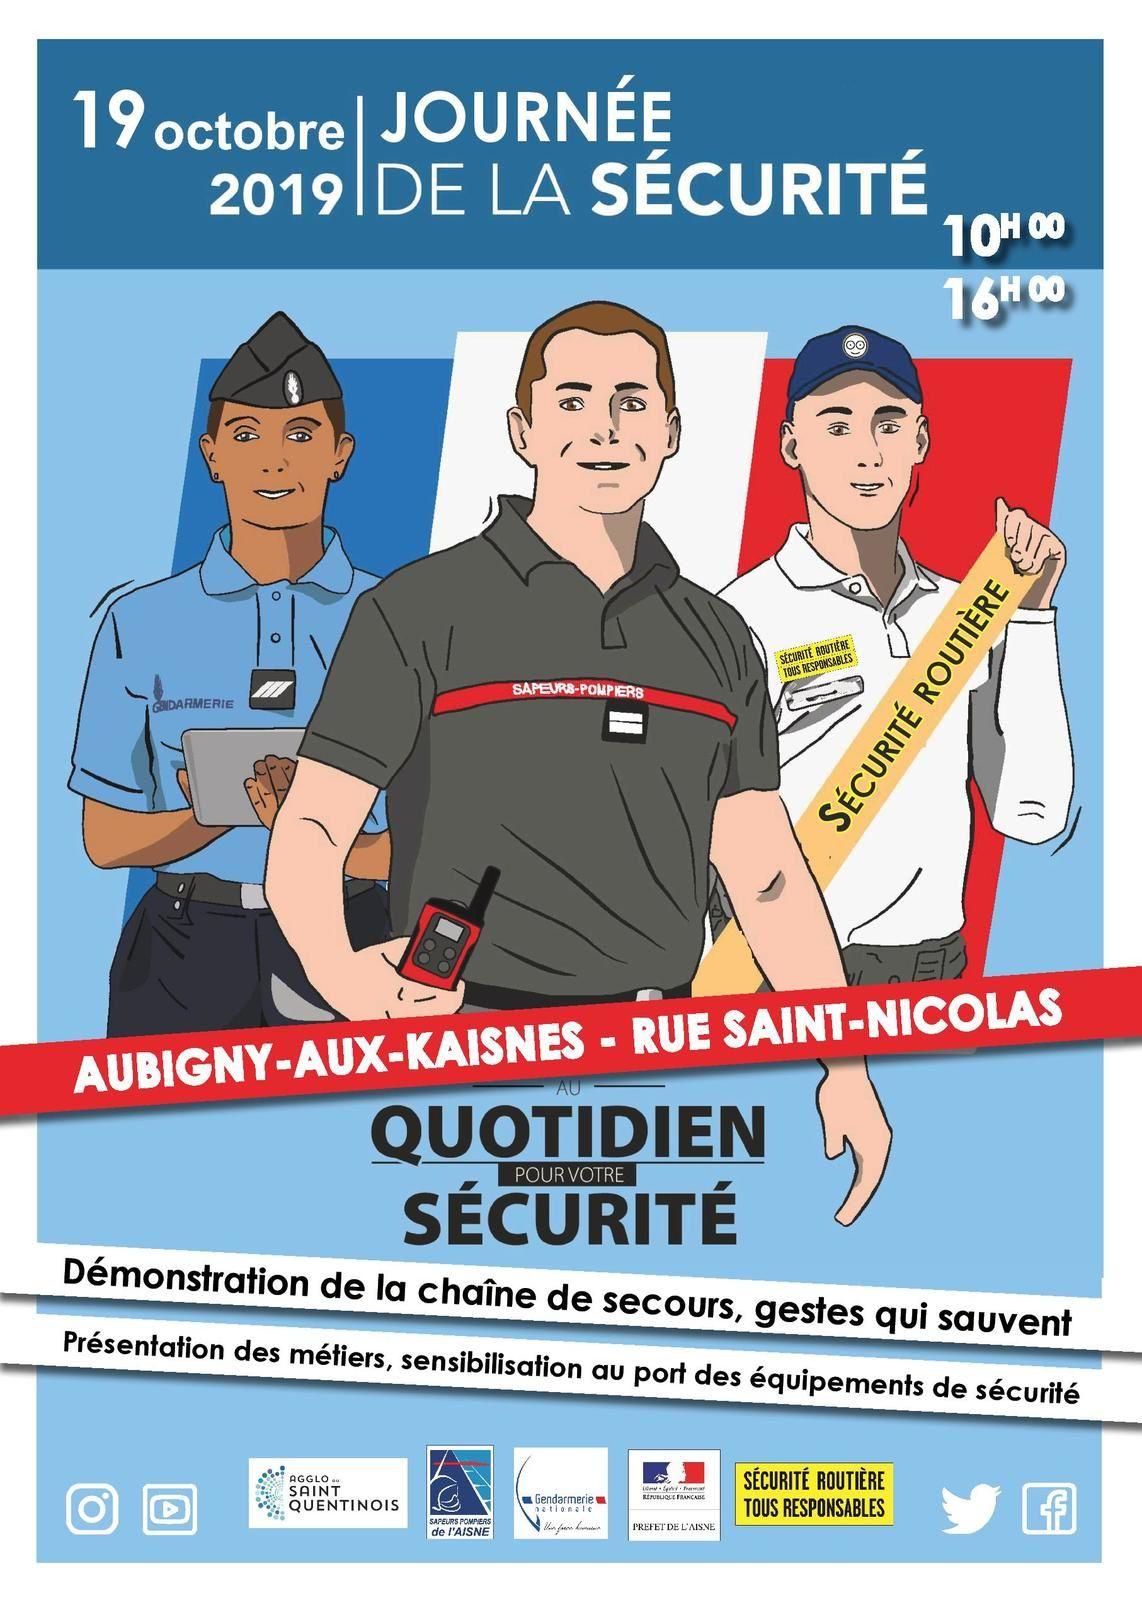 Info Agglo du Saint-Quentinois, info Mairie.